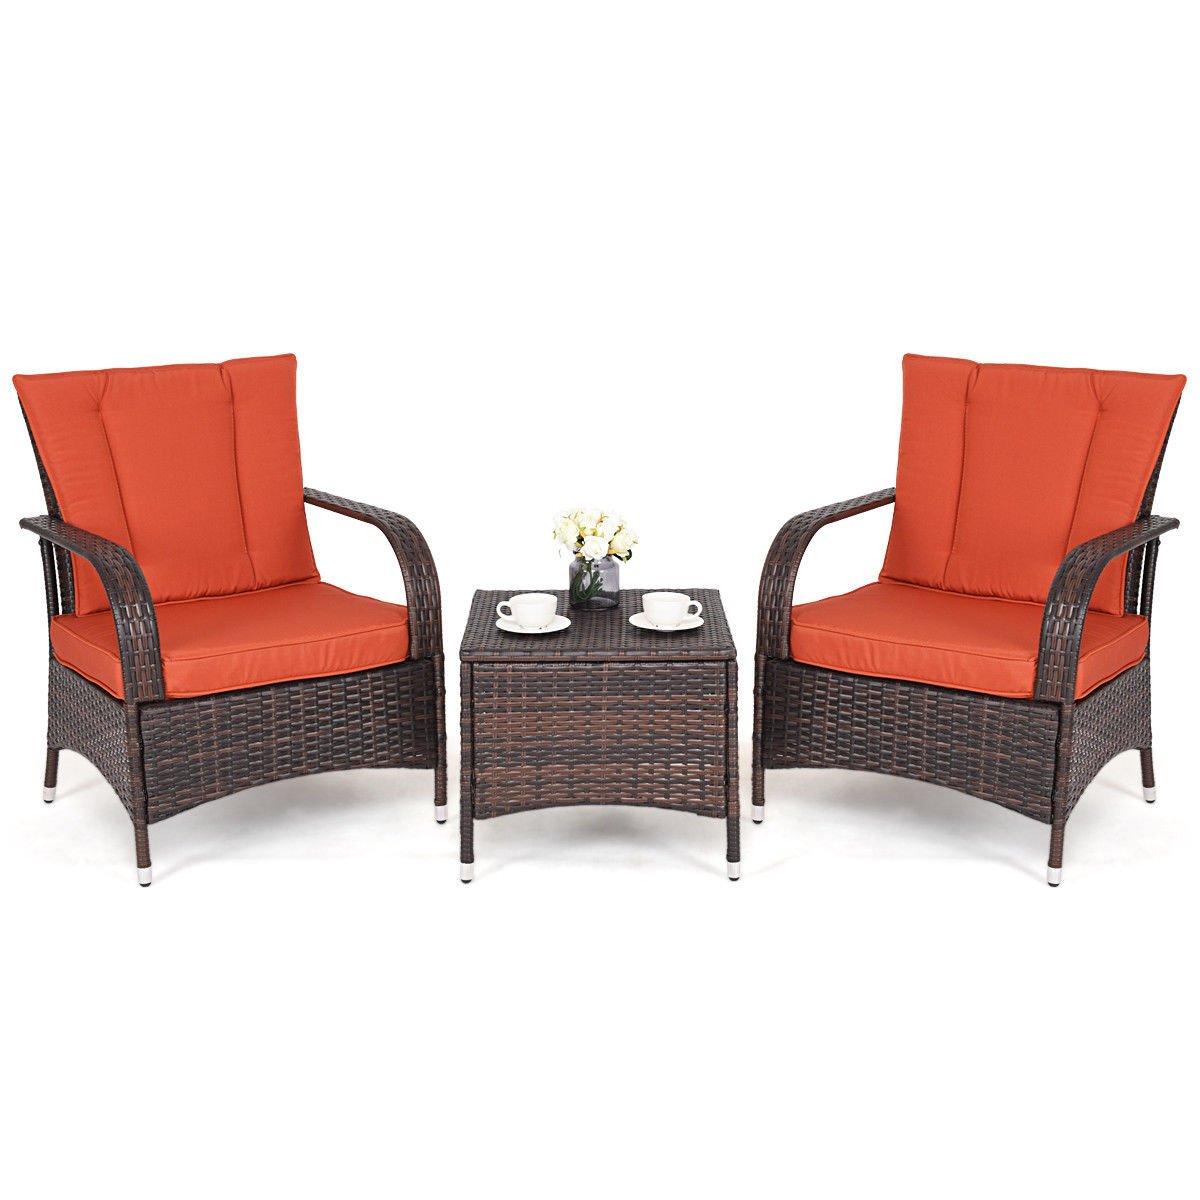 Aromdeeshopping Furniture Set Seat Cushioned Orange Outdoor Patio Mix Brown Rattan Wicker 3PC by Aromdeeshopping